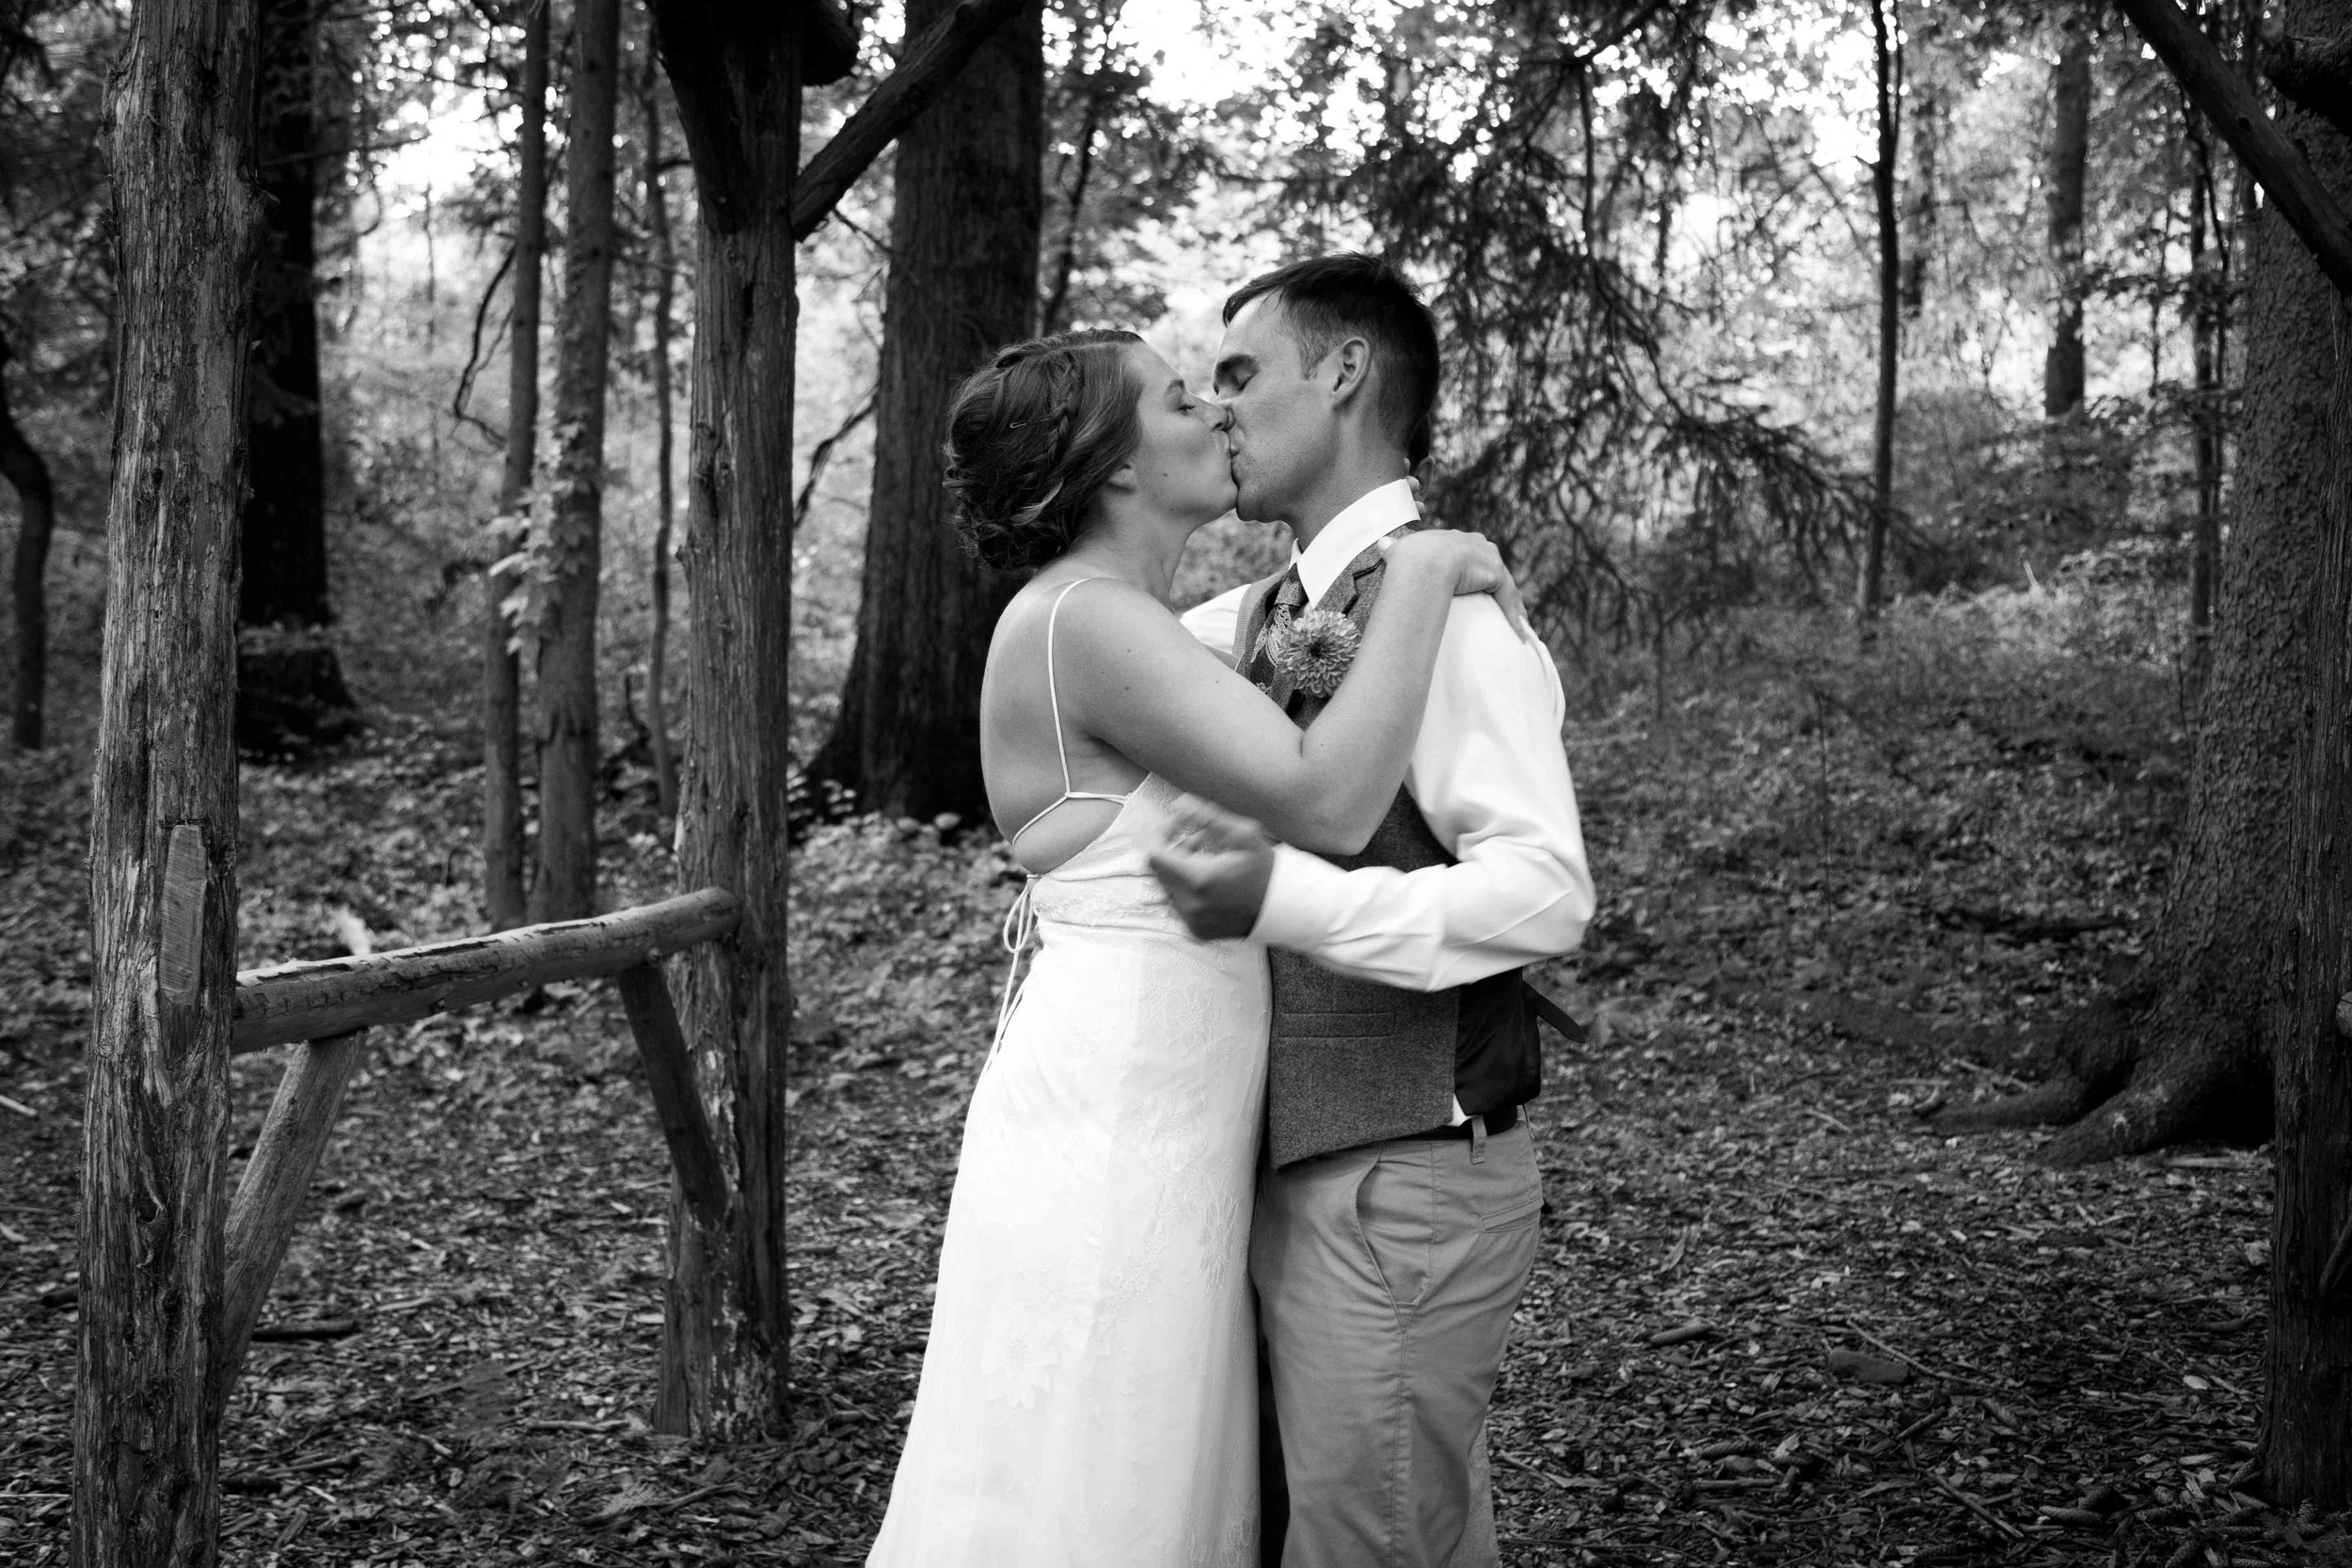 Maskers Barn Deserted Village Berkley Heights NJ Wedding Photographer-31.jpg